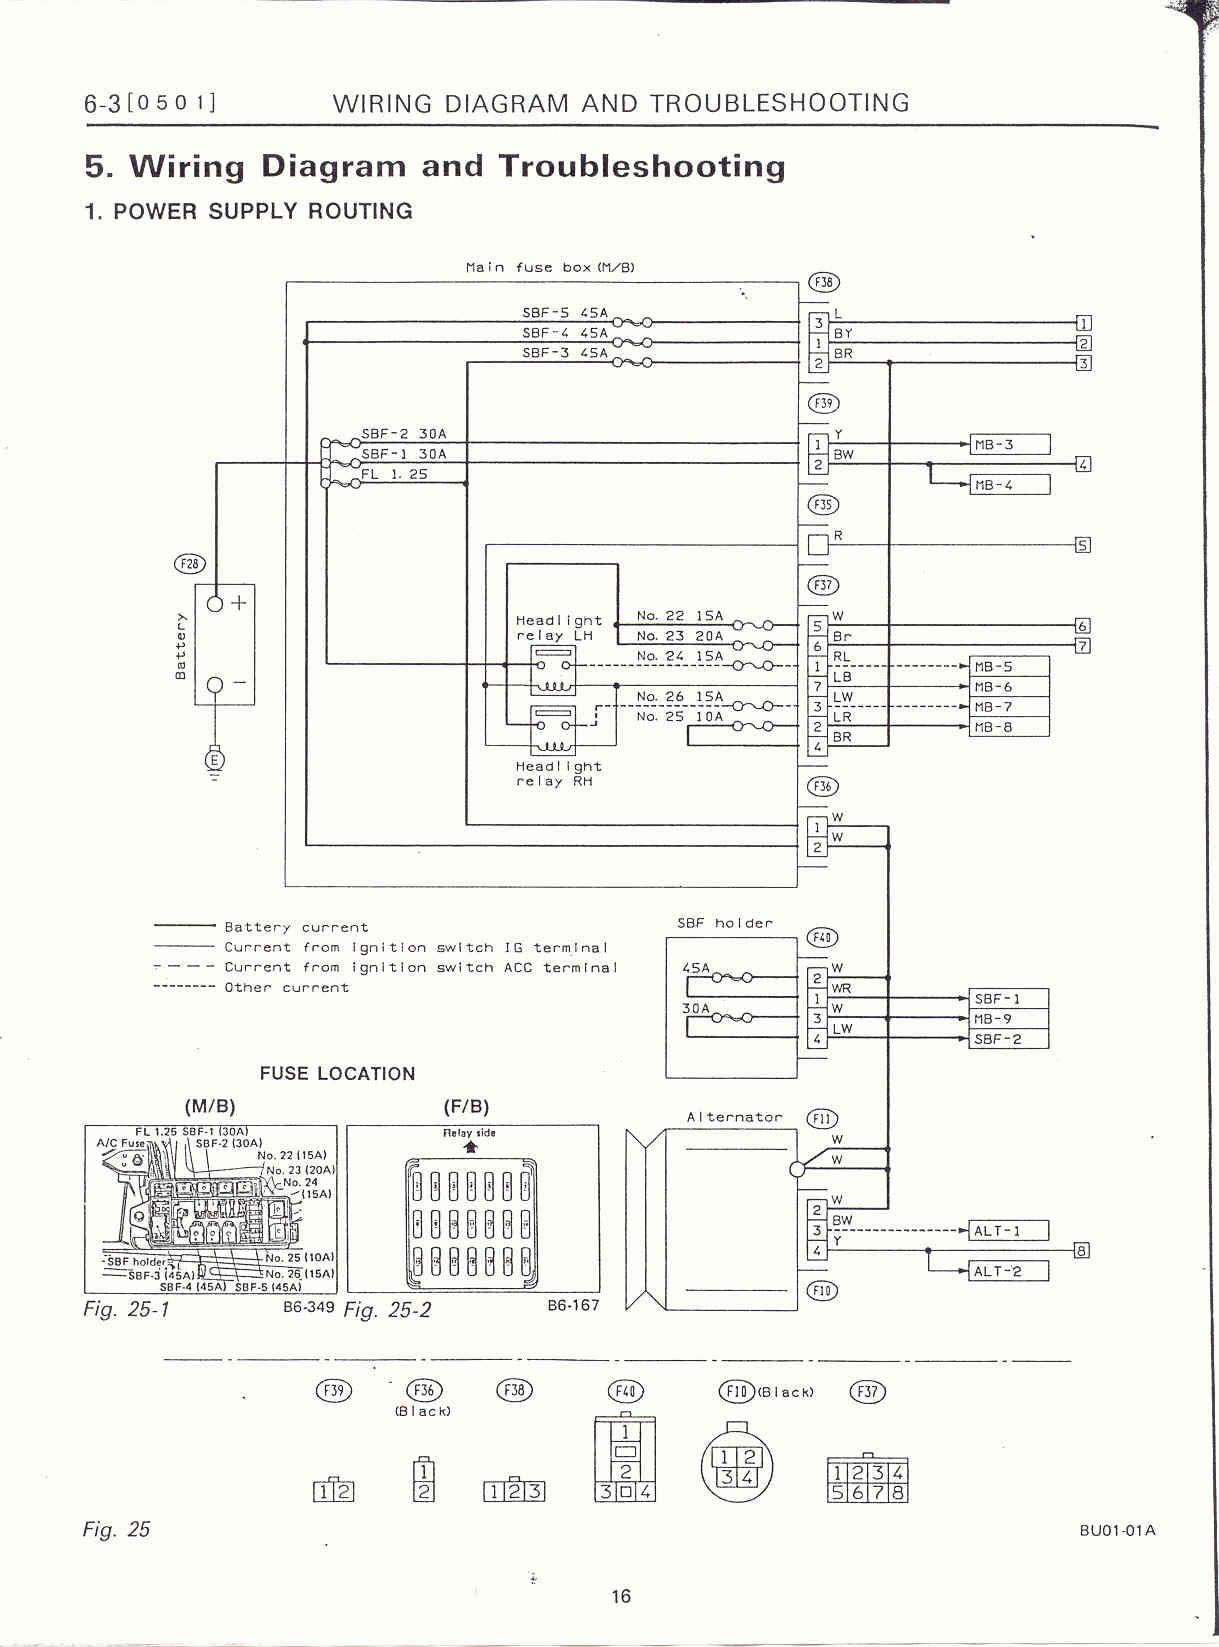 95 Subaru Legacy Wiring Diagram - Wiring Diagram Networks